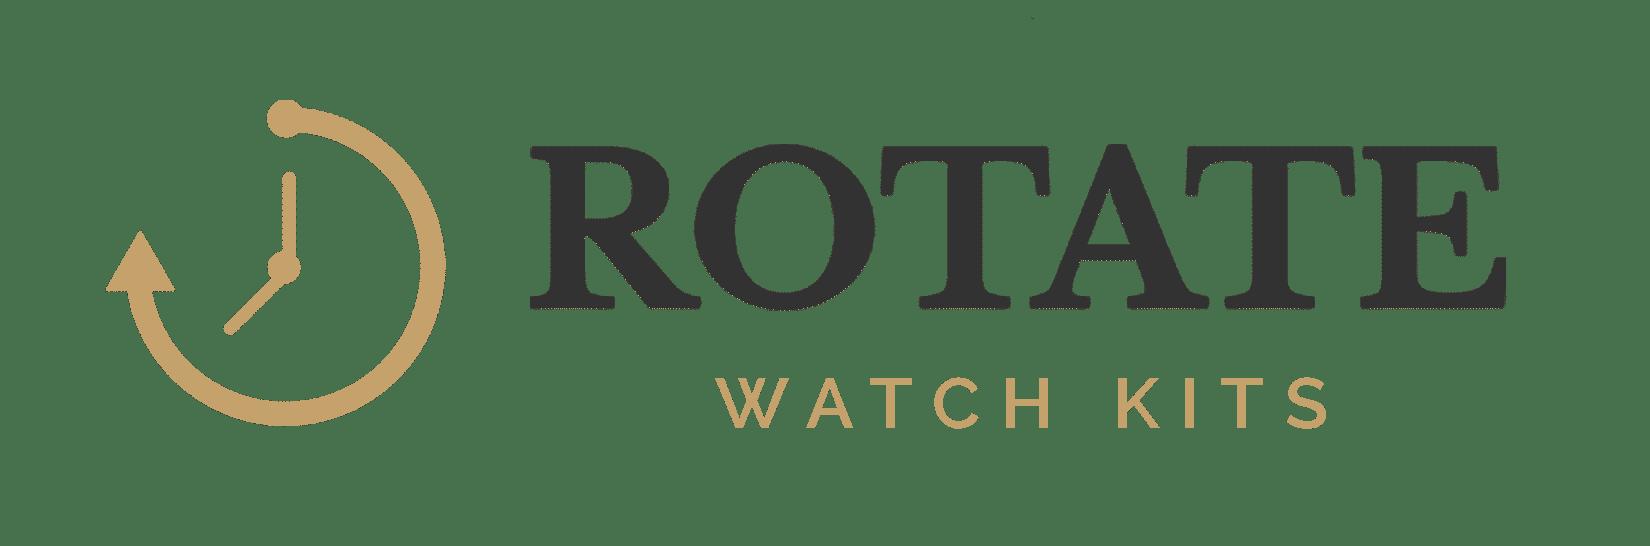 Rotate Watch Kits